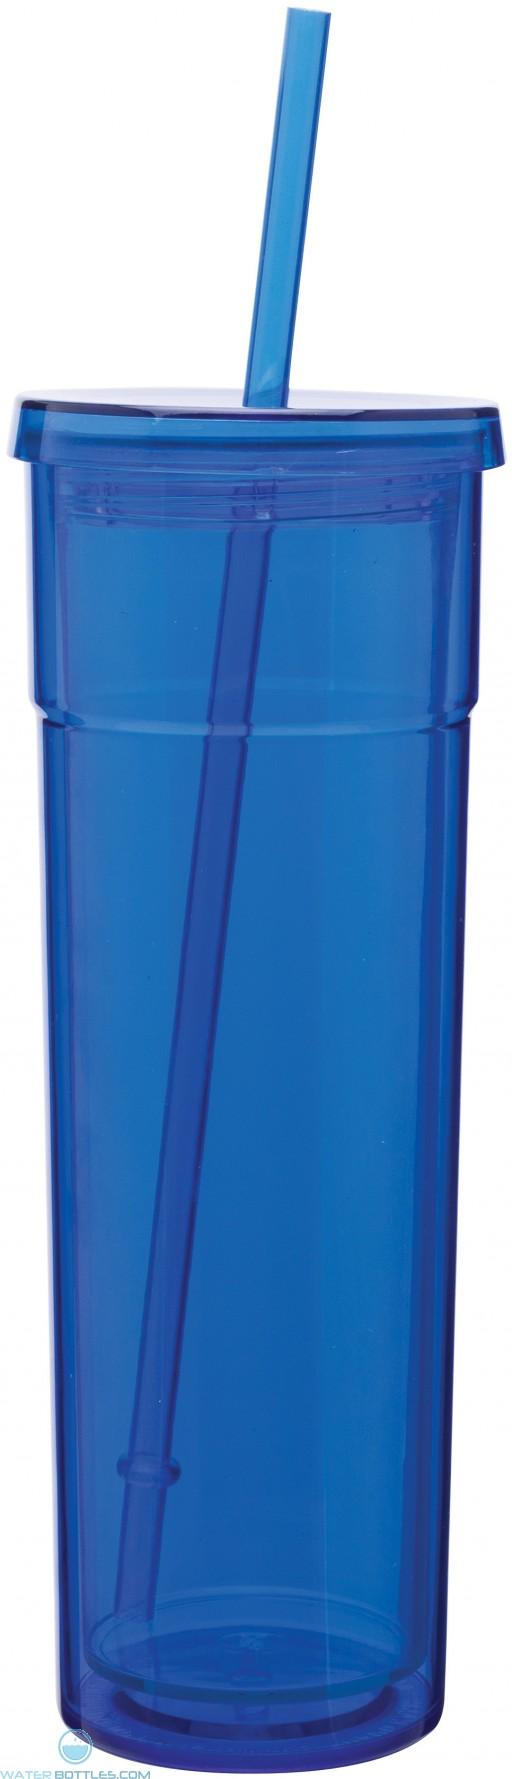 16 oz torino-blue